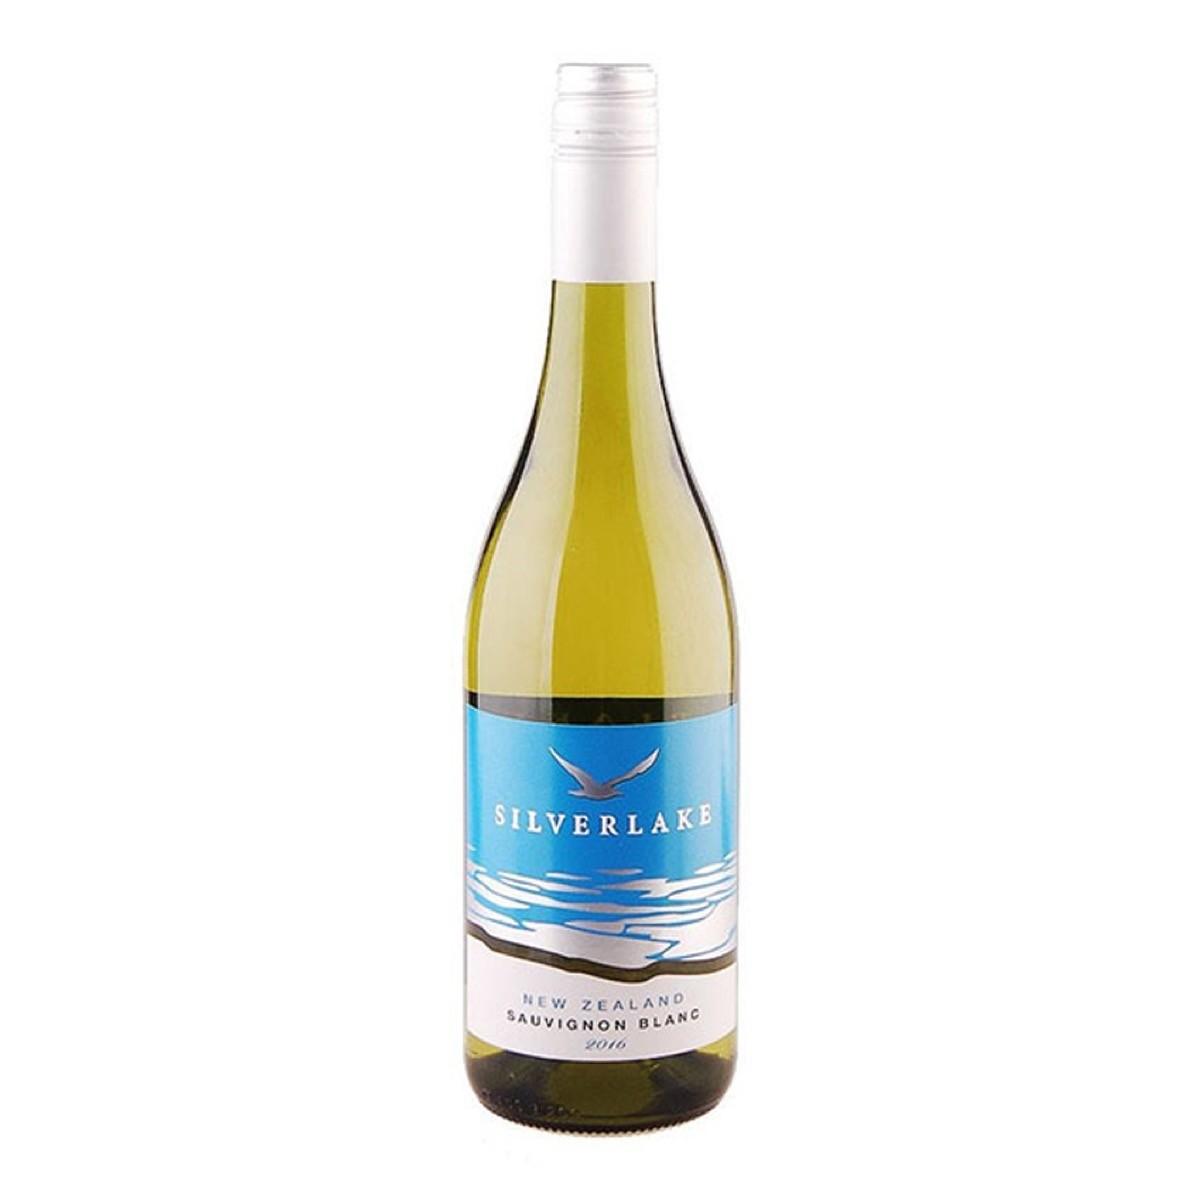 Silverlake Sauvignon Blanc 2018